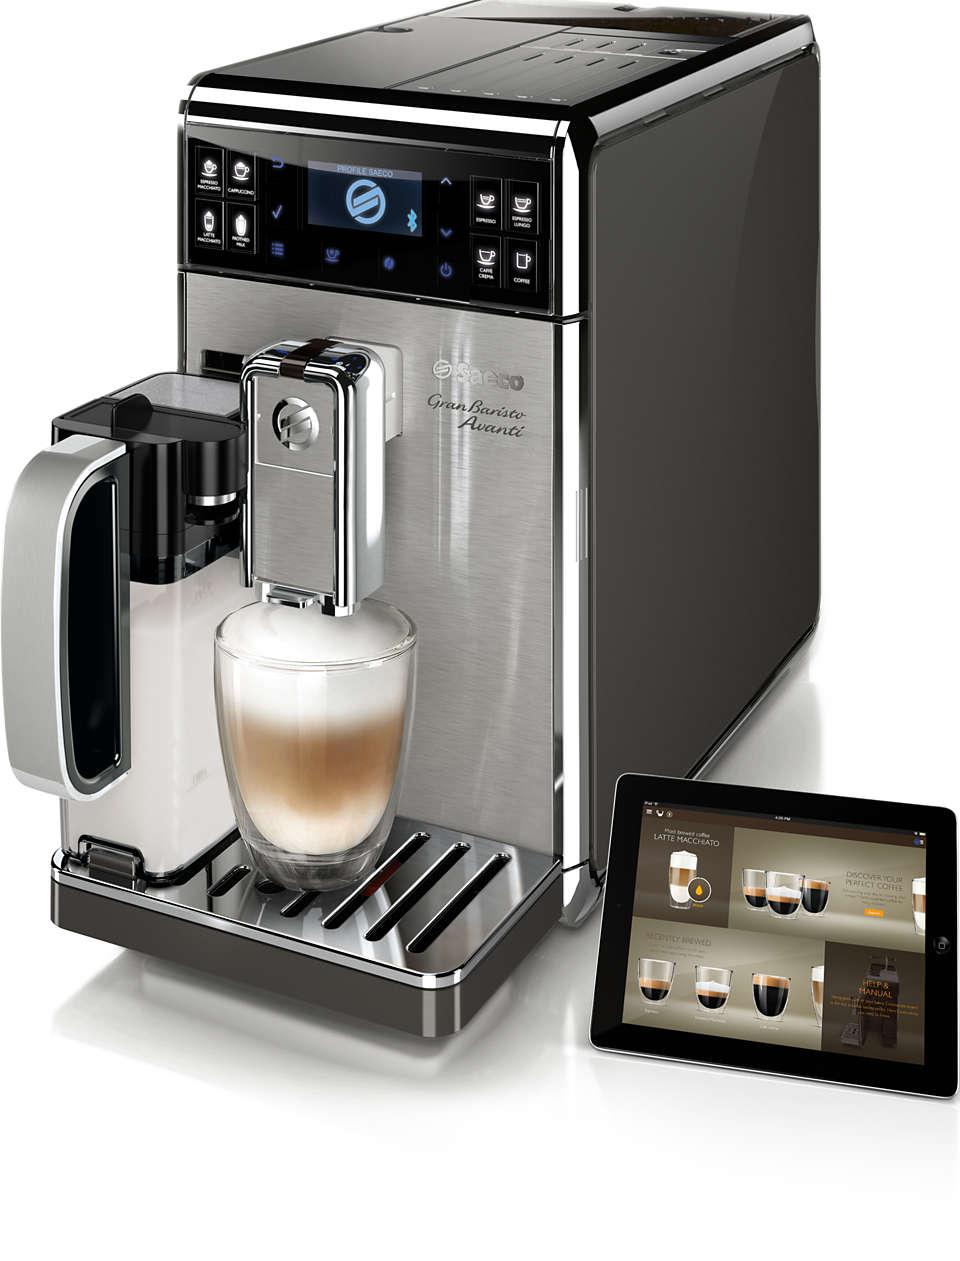 Den mest avancerade kaffeupplevelsen i hemmet